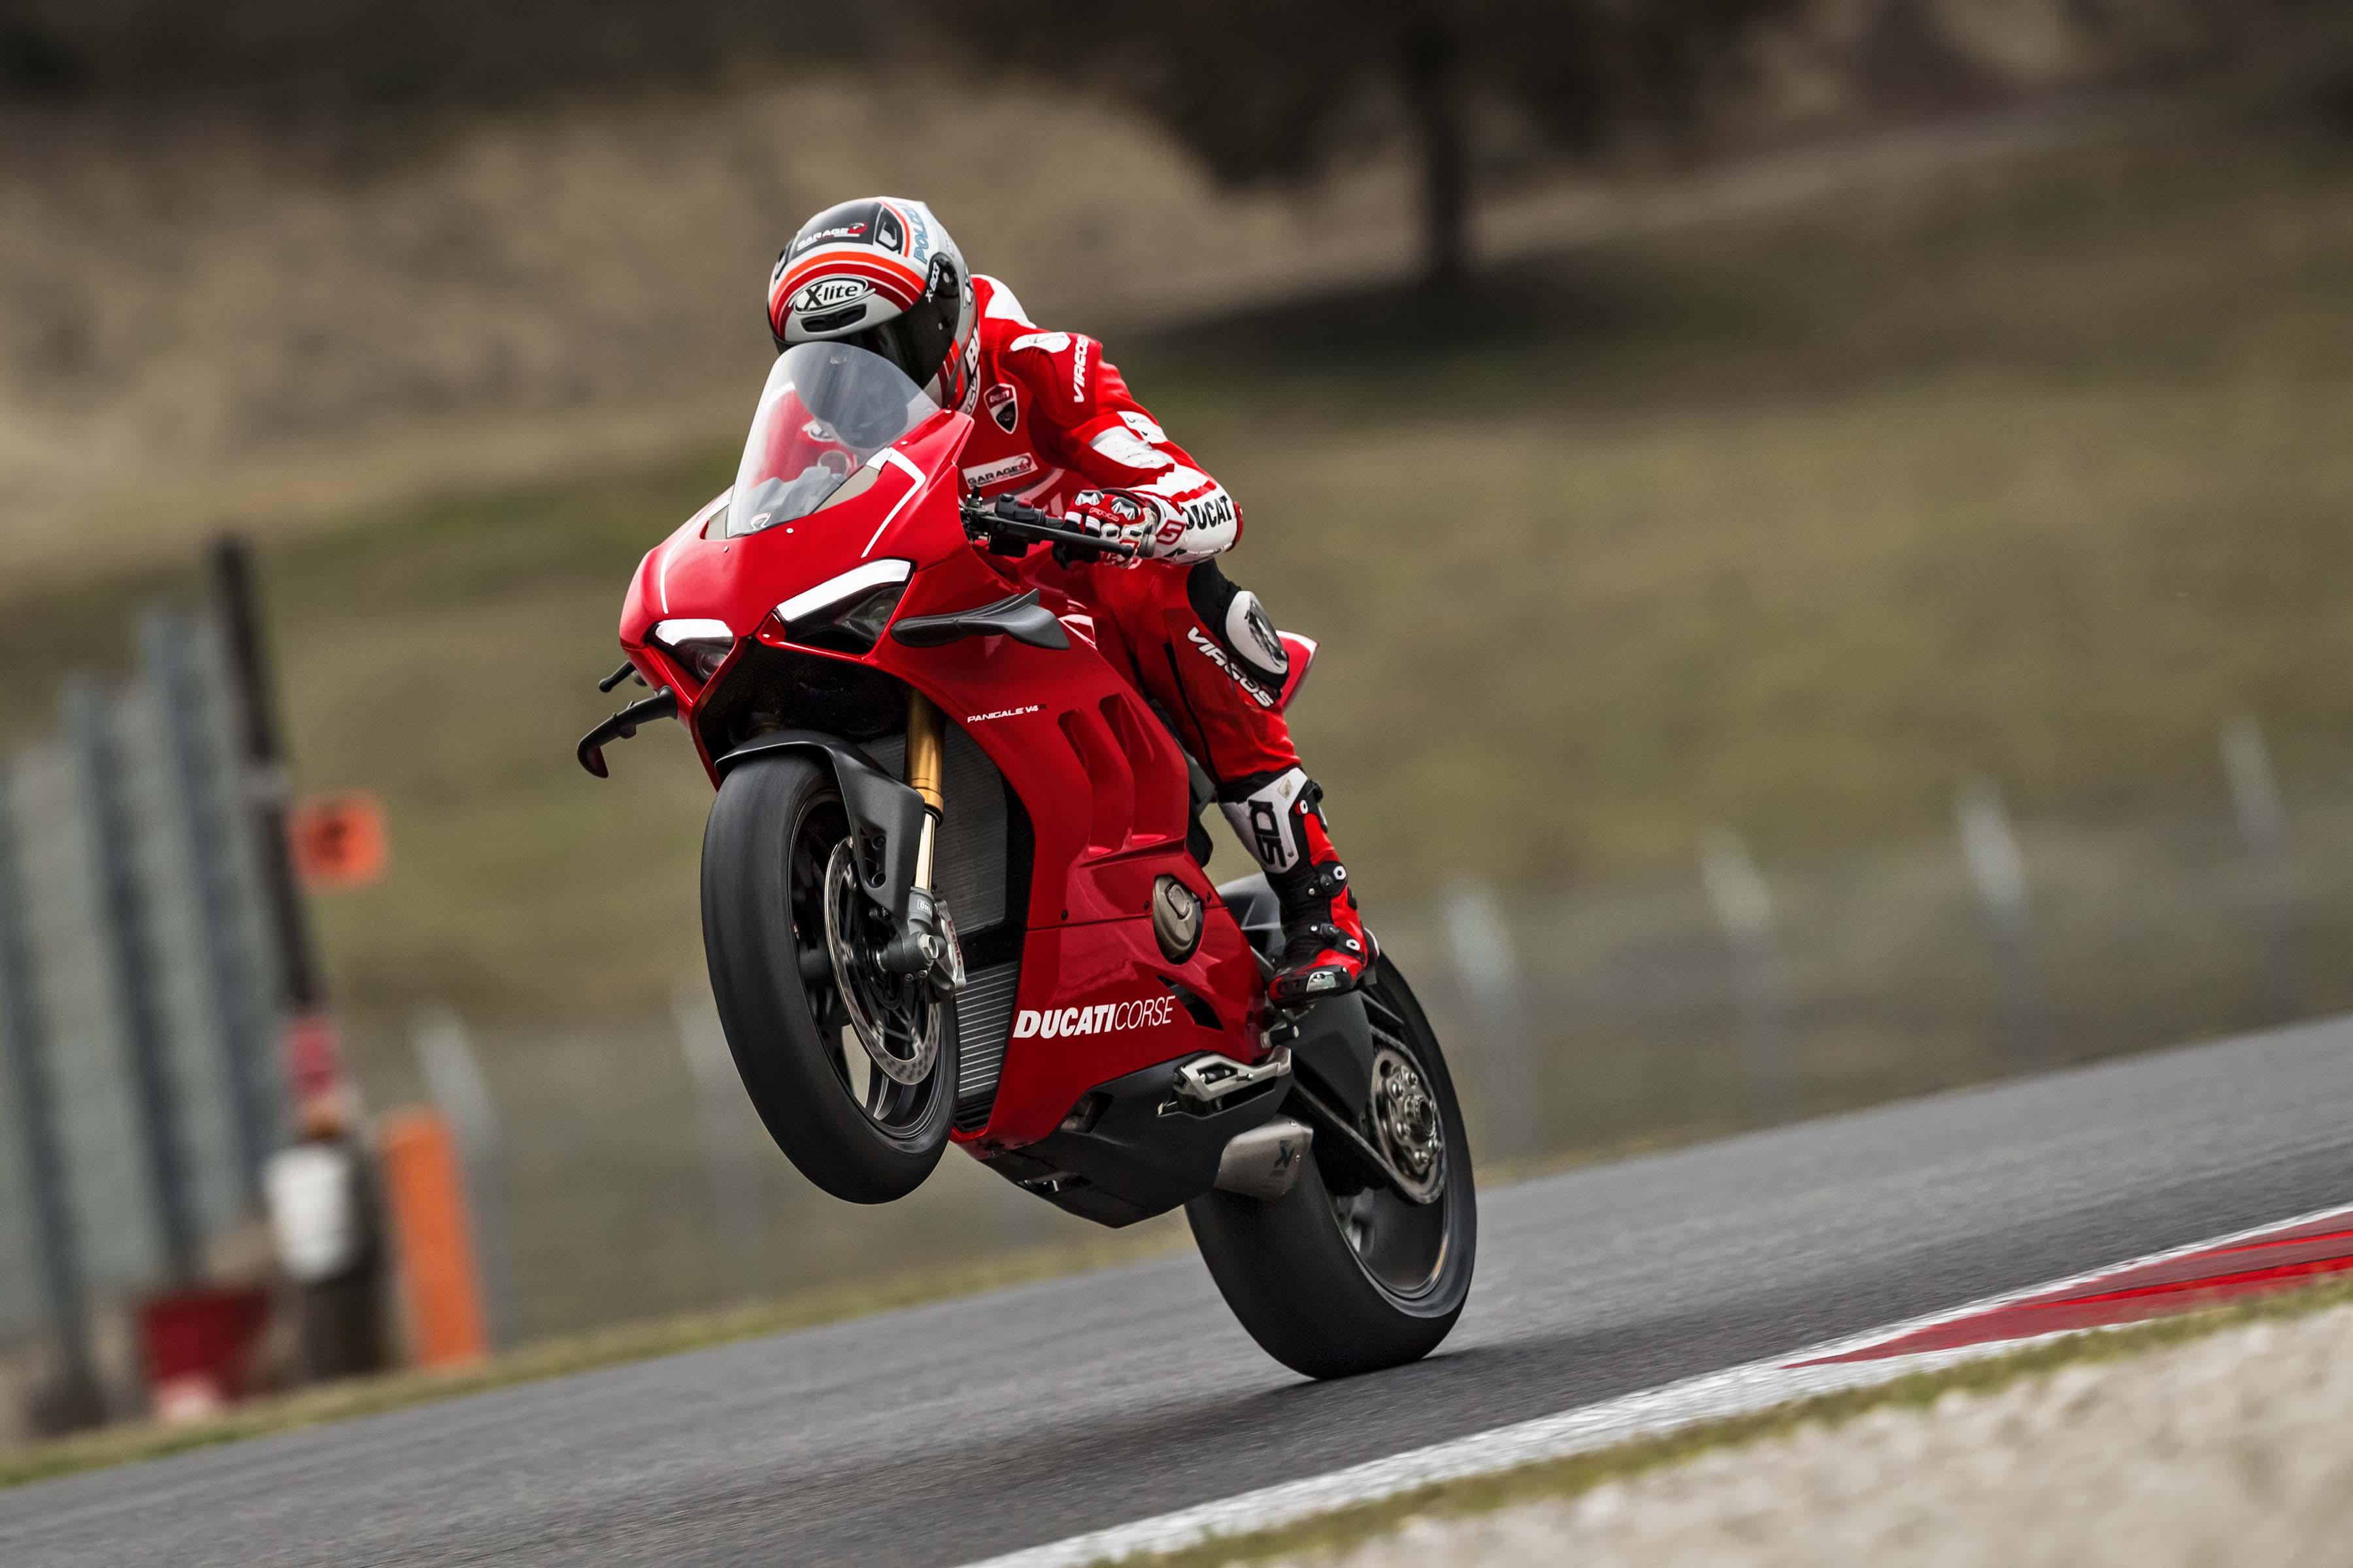 2019-Ducati-Panigale-V4-R-35